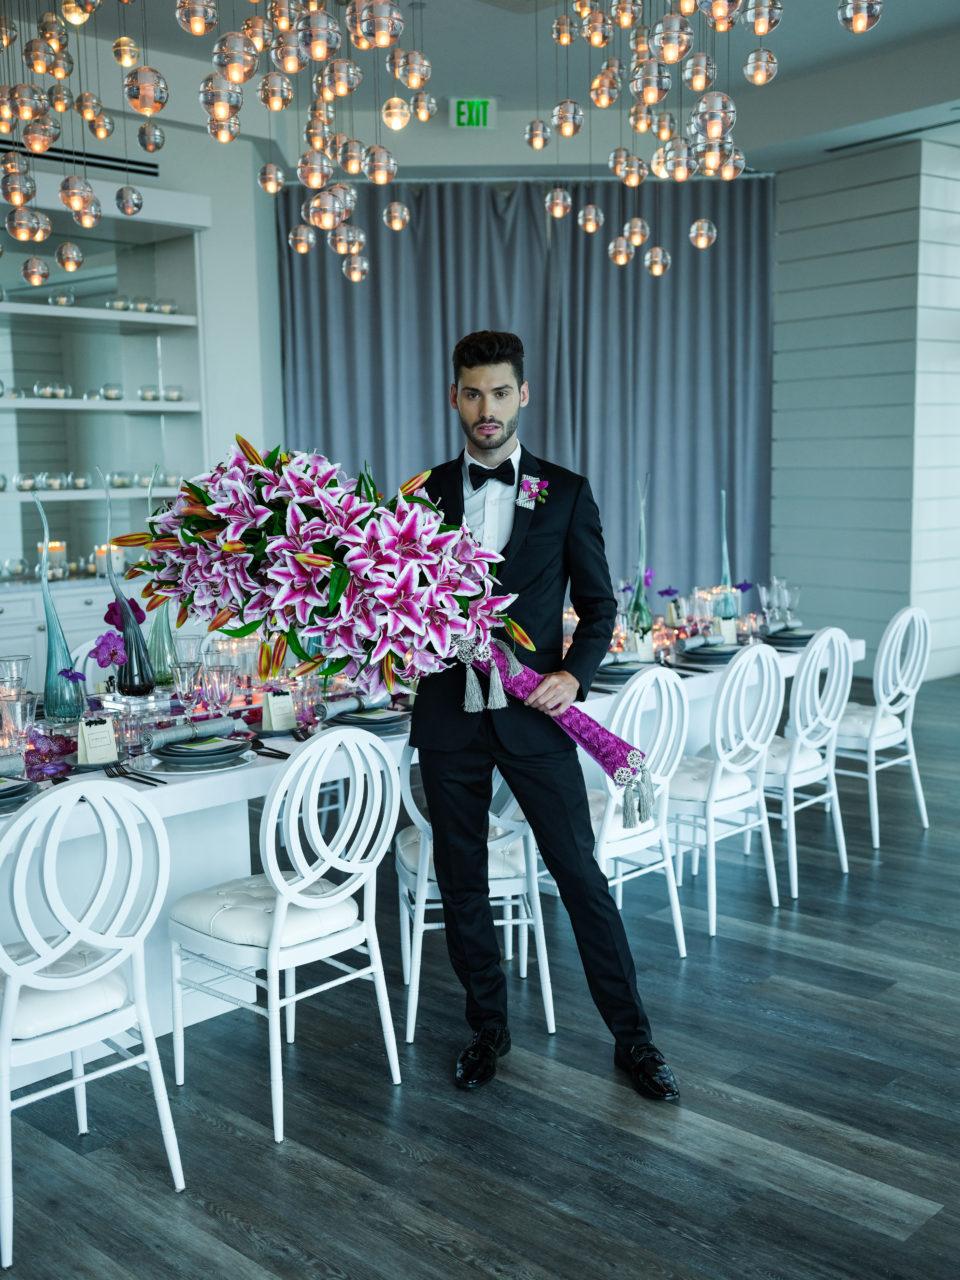 EPIC Staffing Agency chosen as part of the team for Ritz Carlton magazine shoot